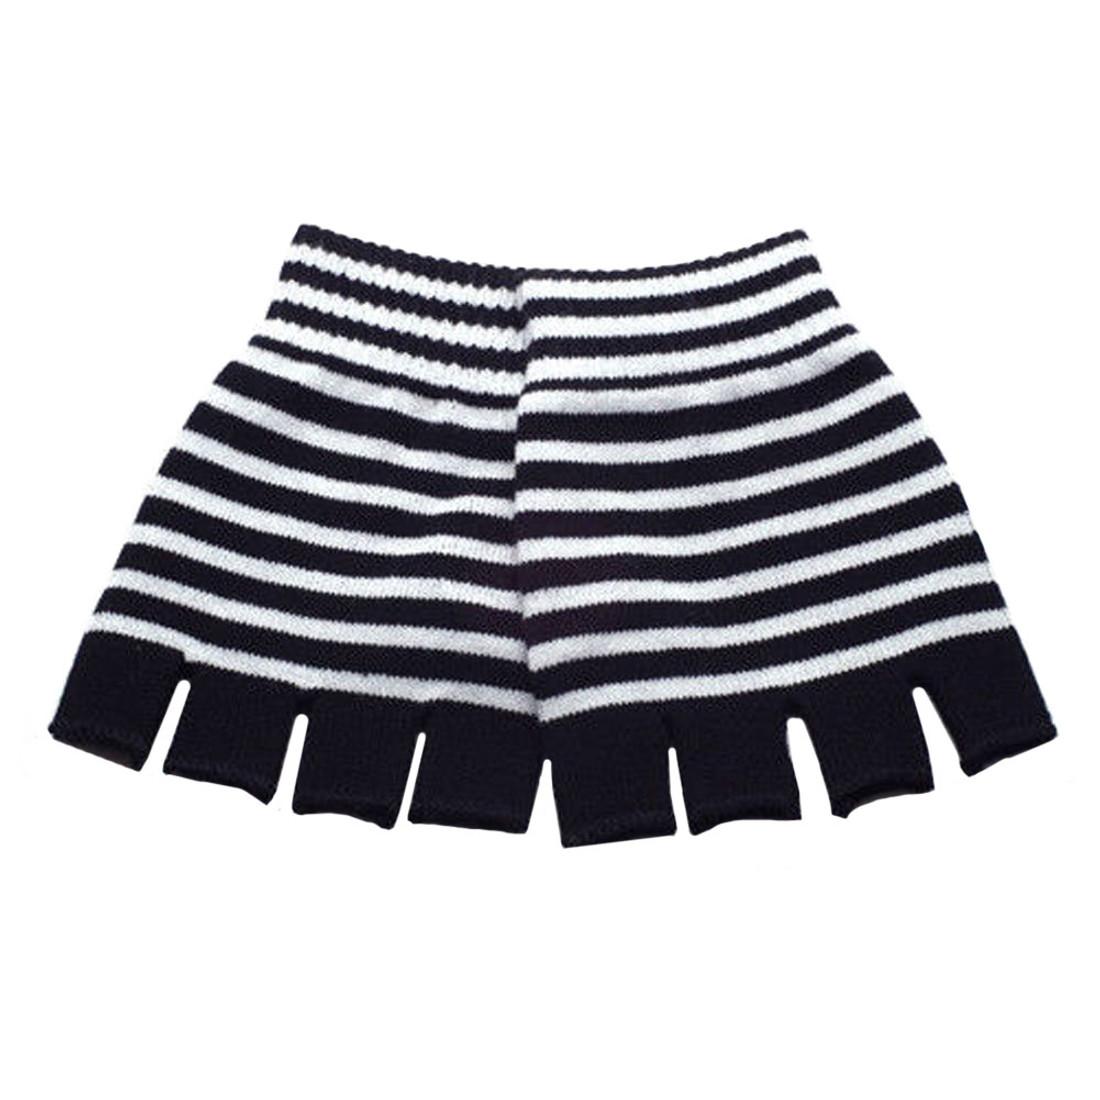 Black and White Striped Knitted Fingerless Gloves